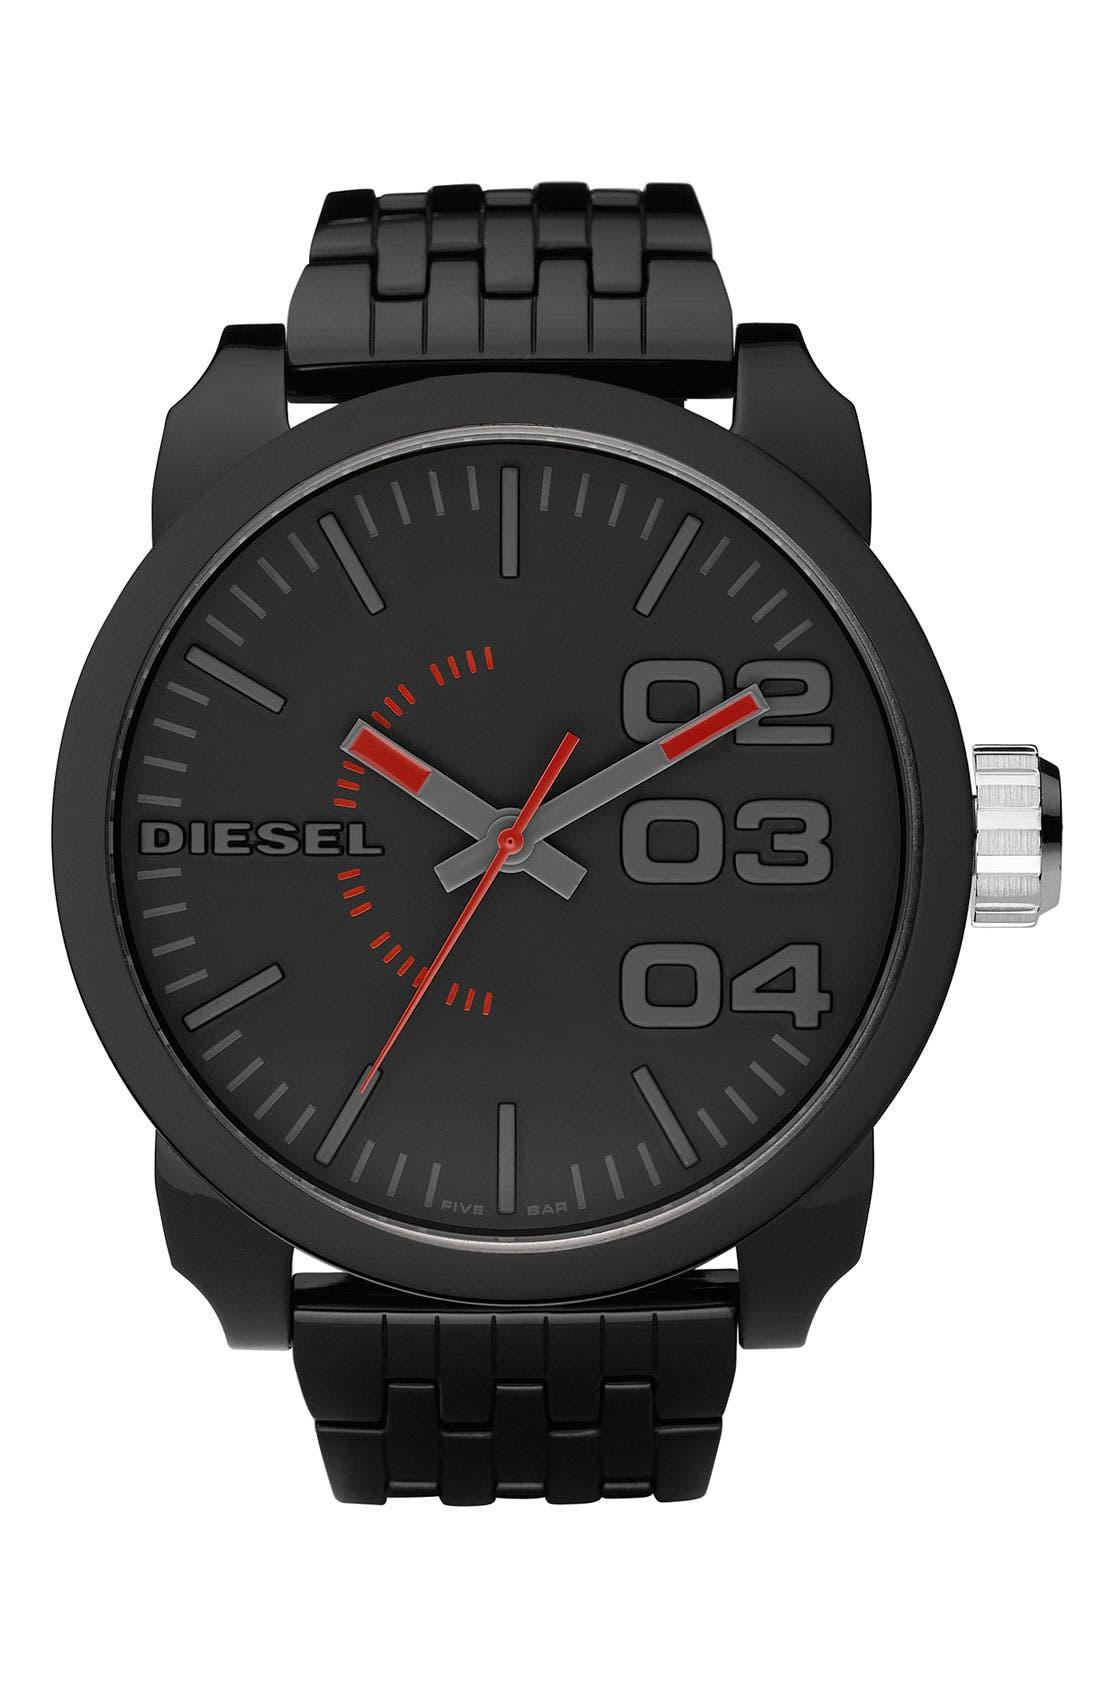 Main Image - DIESEL® 'Franchise' Oversized Round Bracelet Watch, 59mm x 67mm